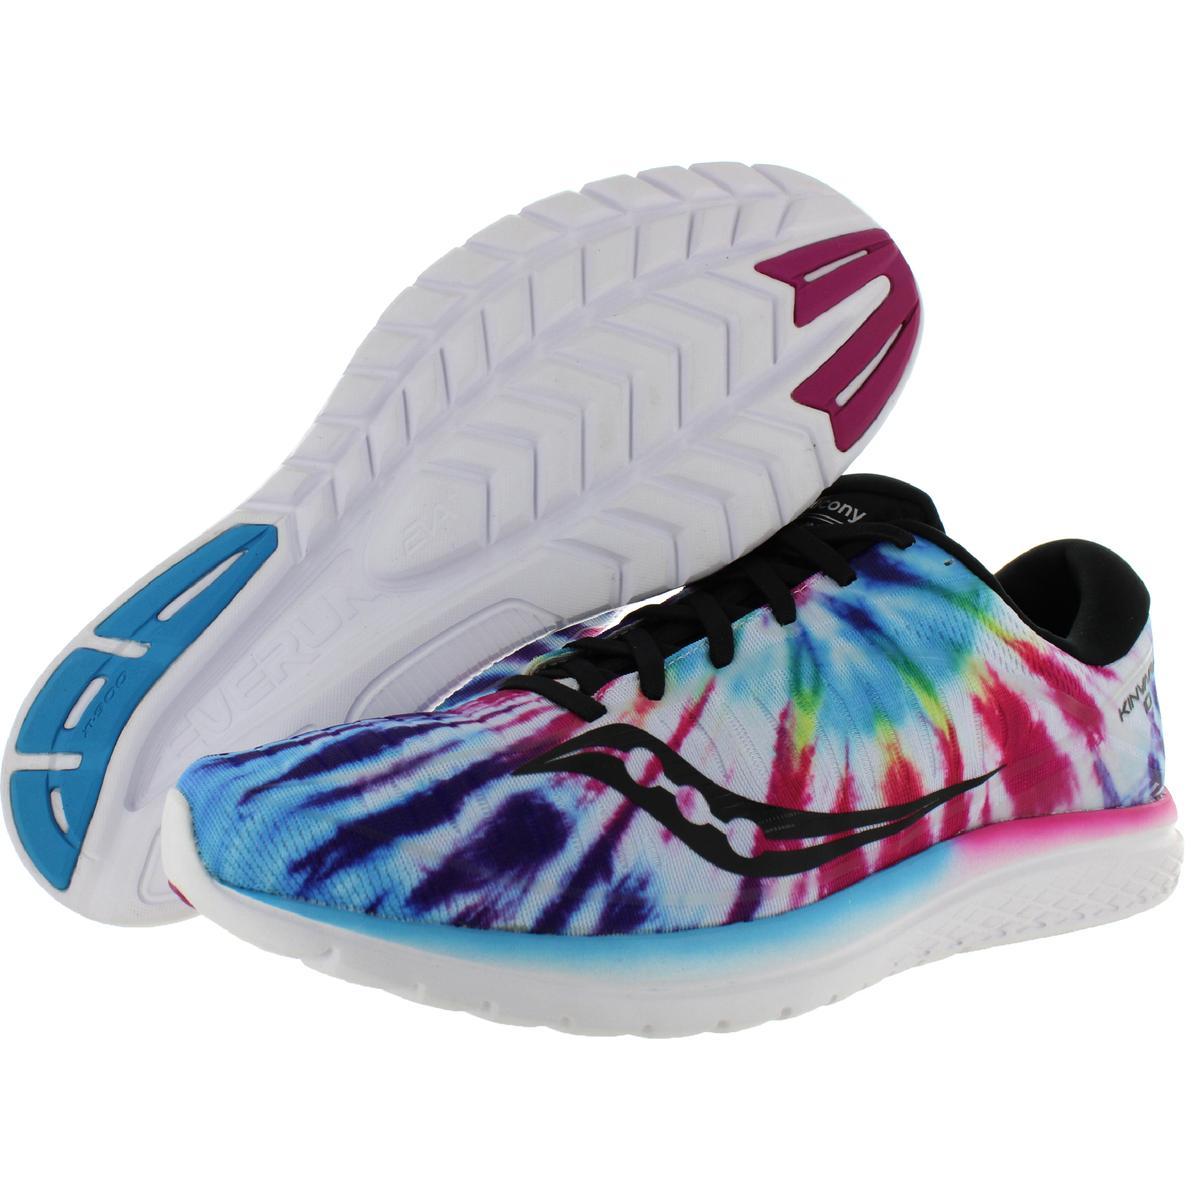 Saucony-Herren-Kinvara-10-Comfort-Running-Turnschuhe-Sneakers-Schuhe-bhfo-3377 Indexbild 7